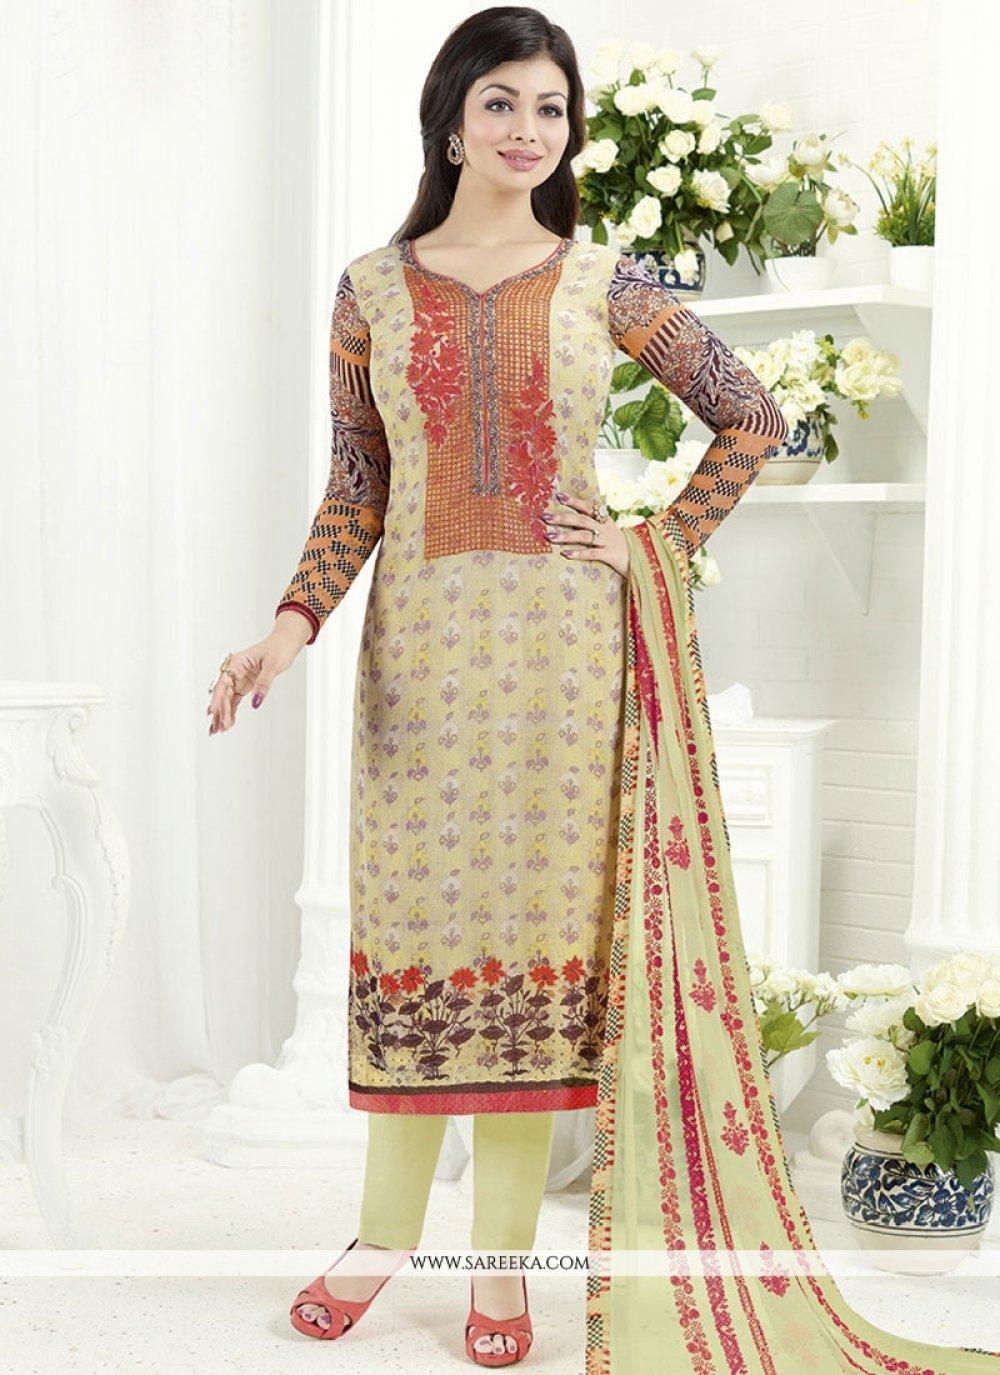 Ayesha Takia Faux Georgette Print Work Churidar Designer Suit